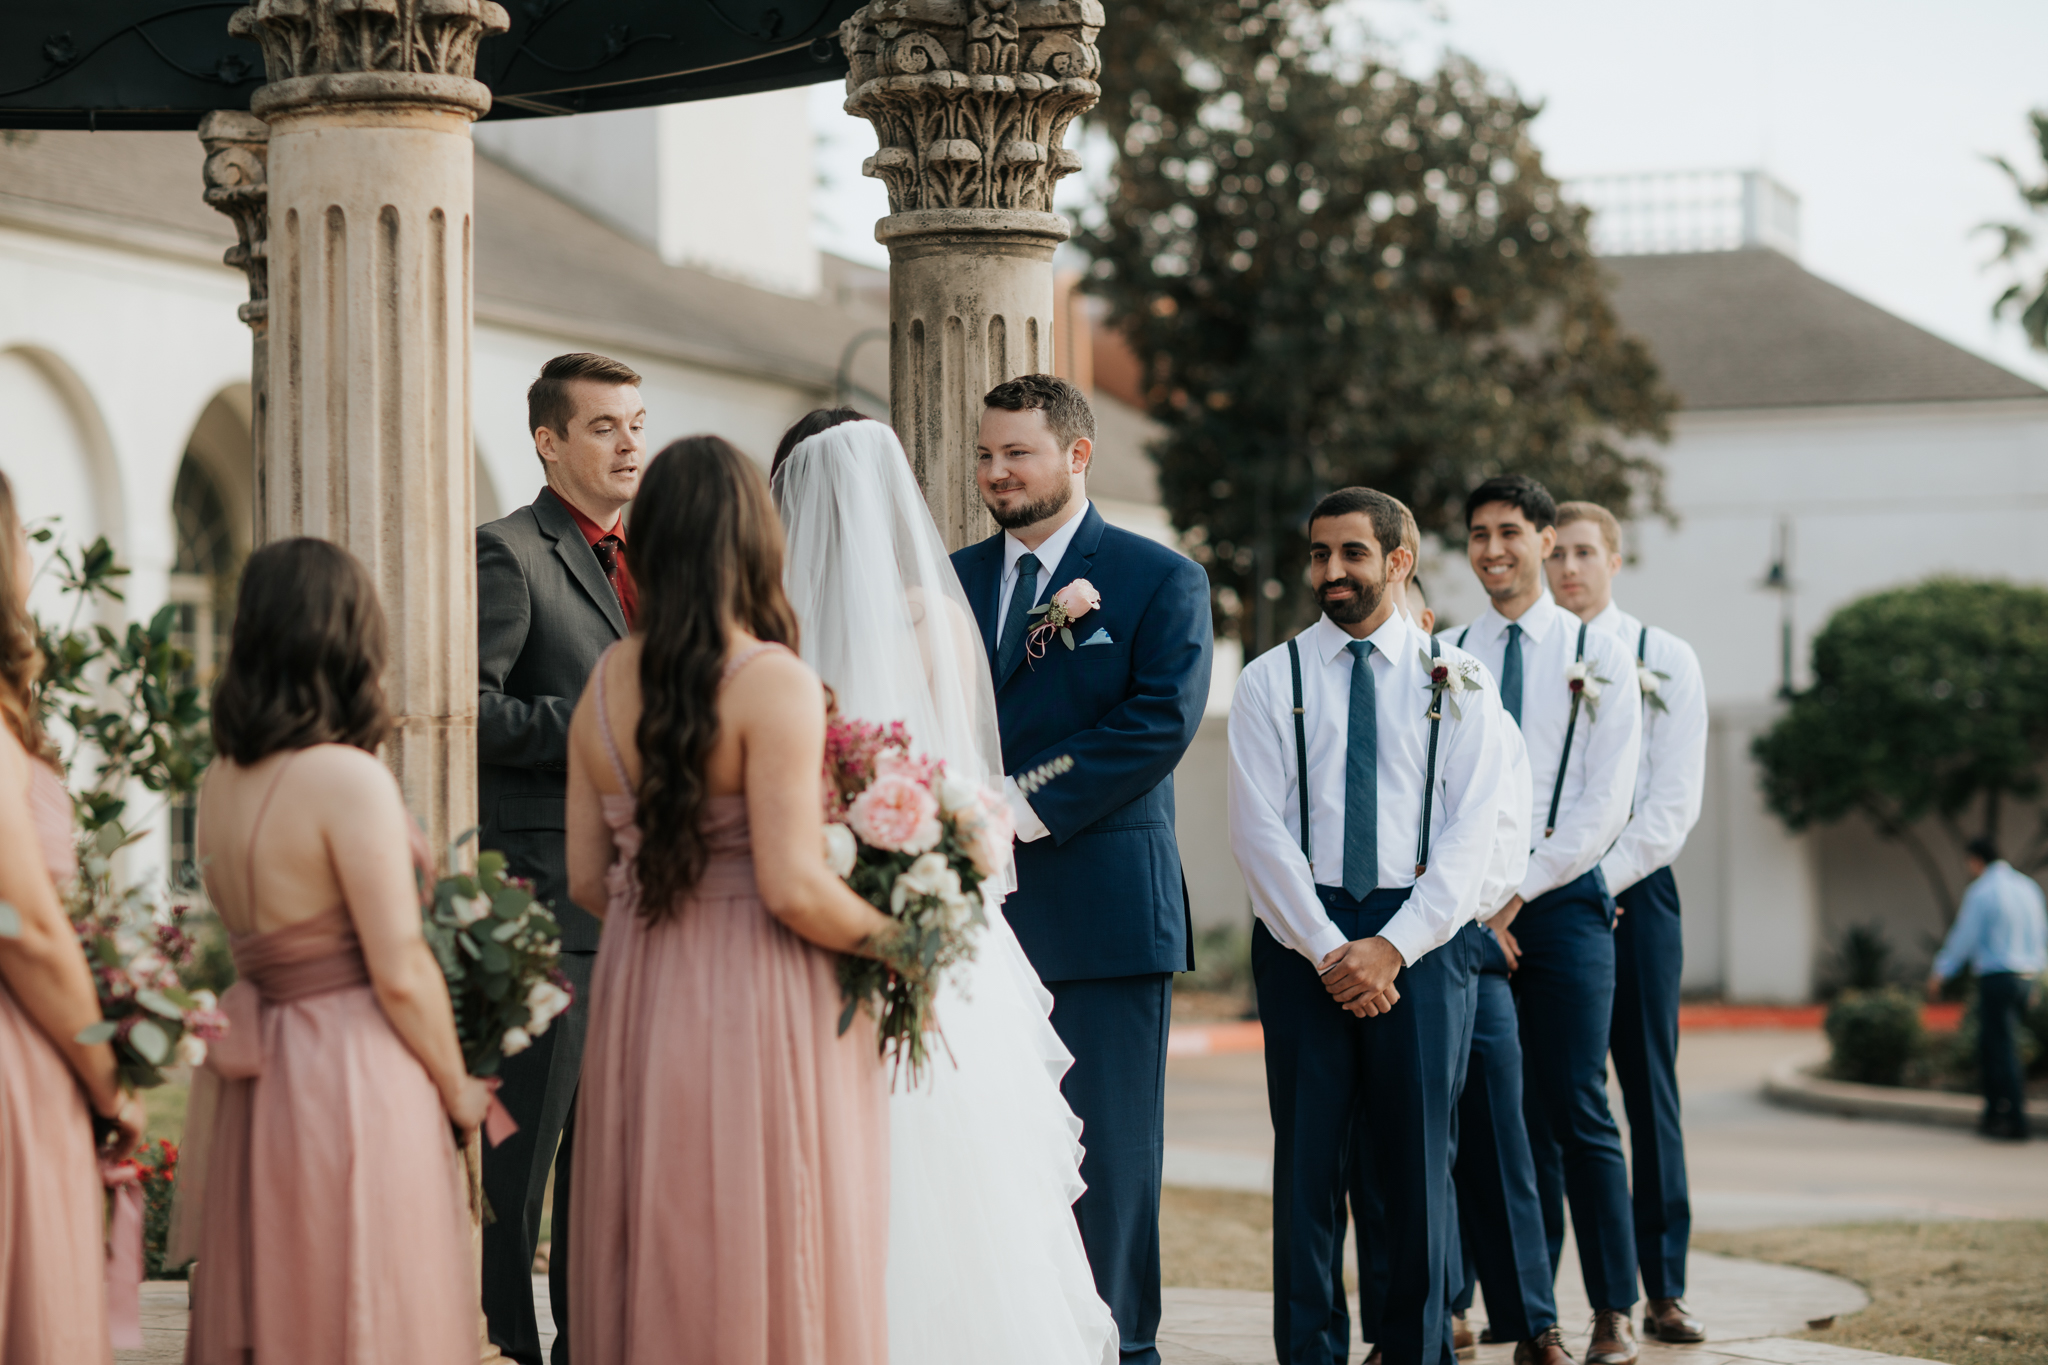 Leah Nicole Photography - Houston Wedding Photographer-Lake Conroe Wedding- Houston Wedding Photographer-31.jpg